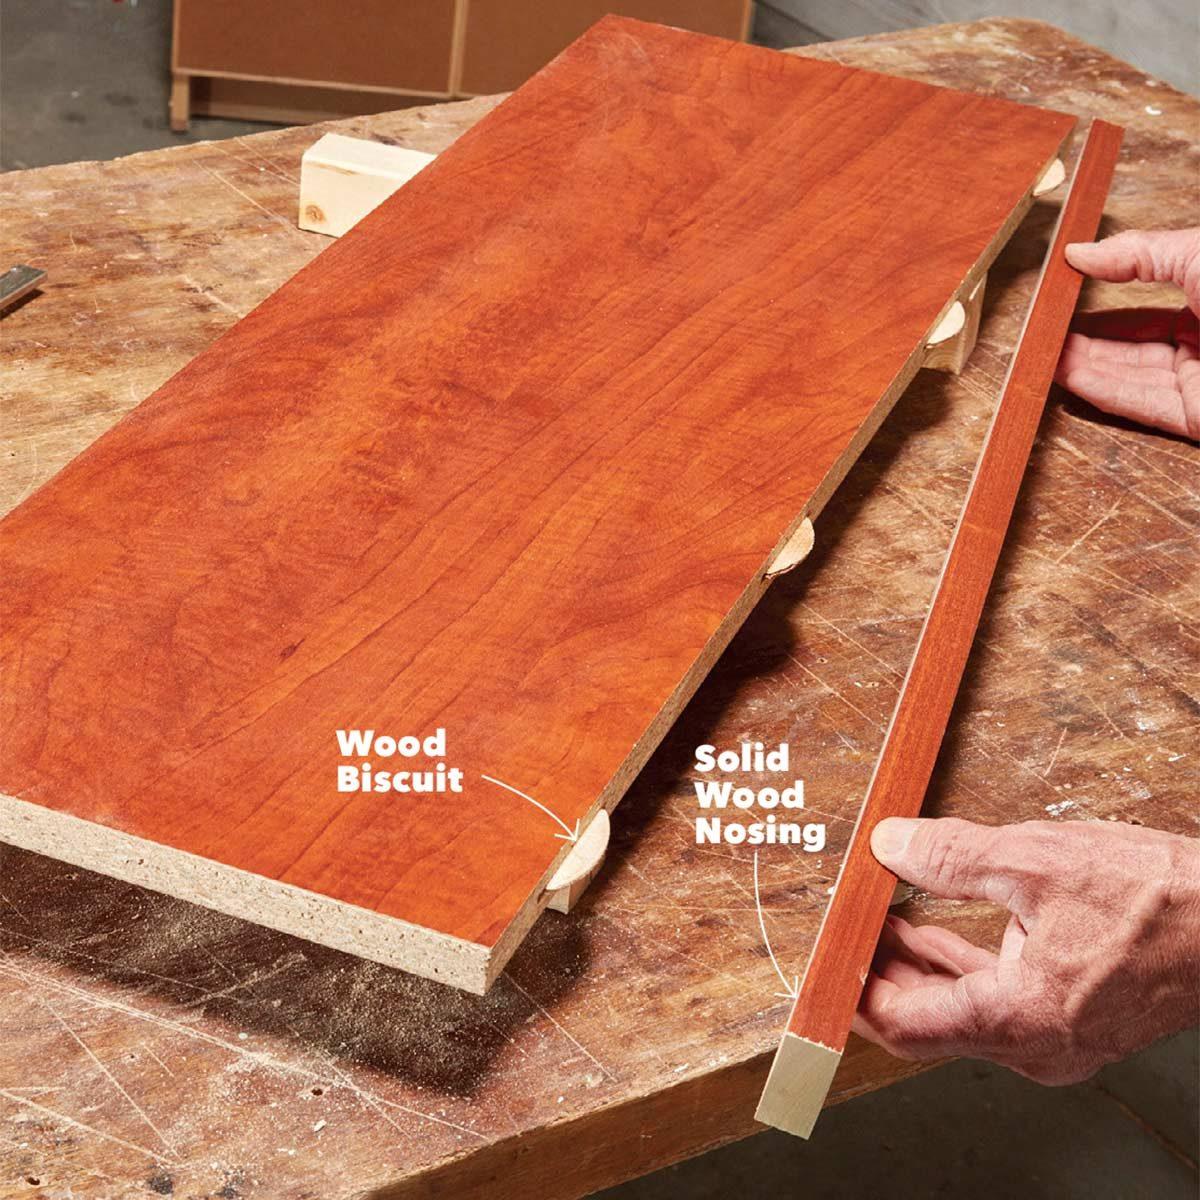 Learn How to Use Melamine | The Family Handyman